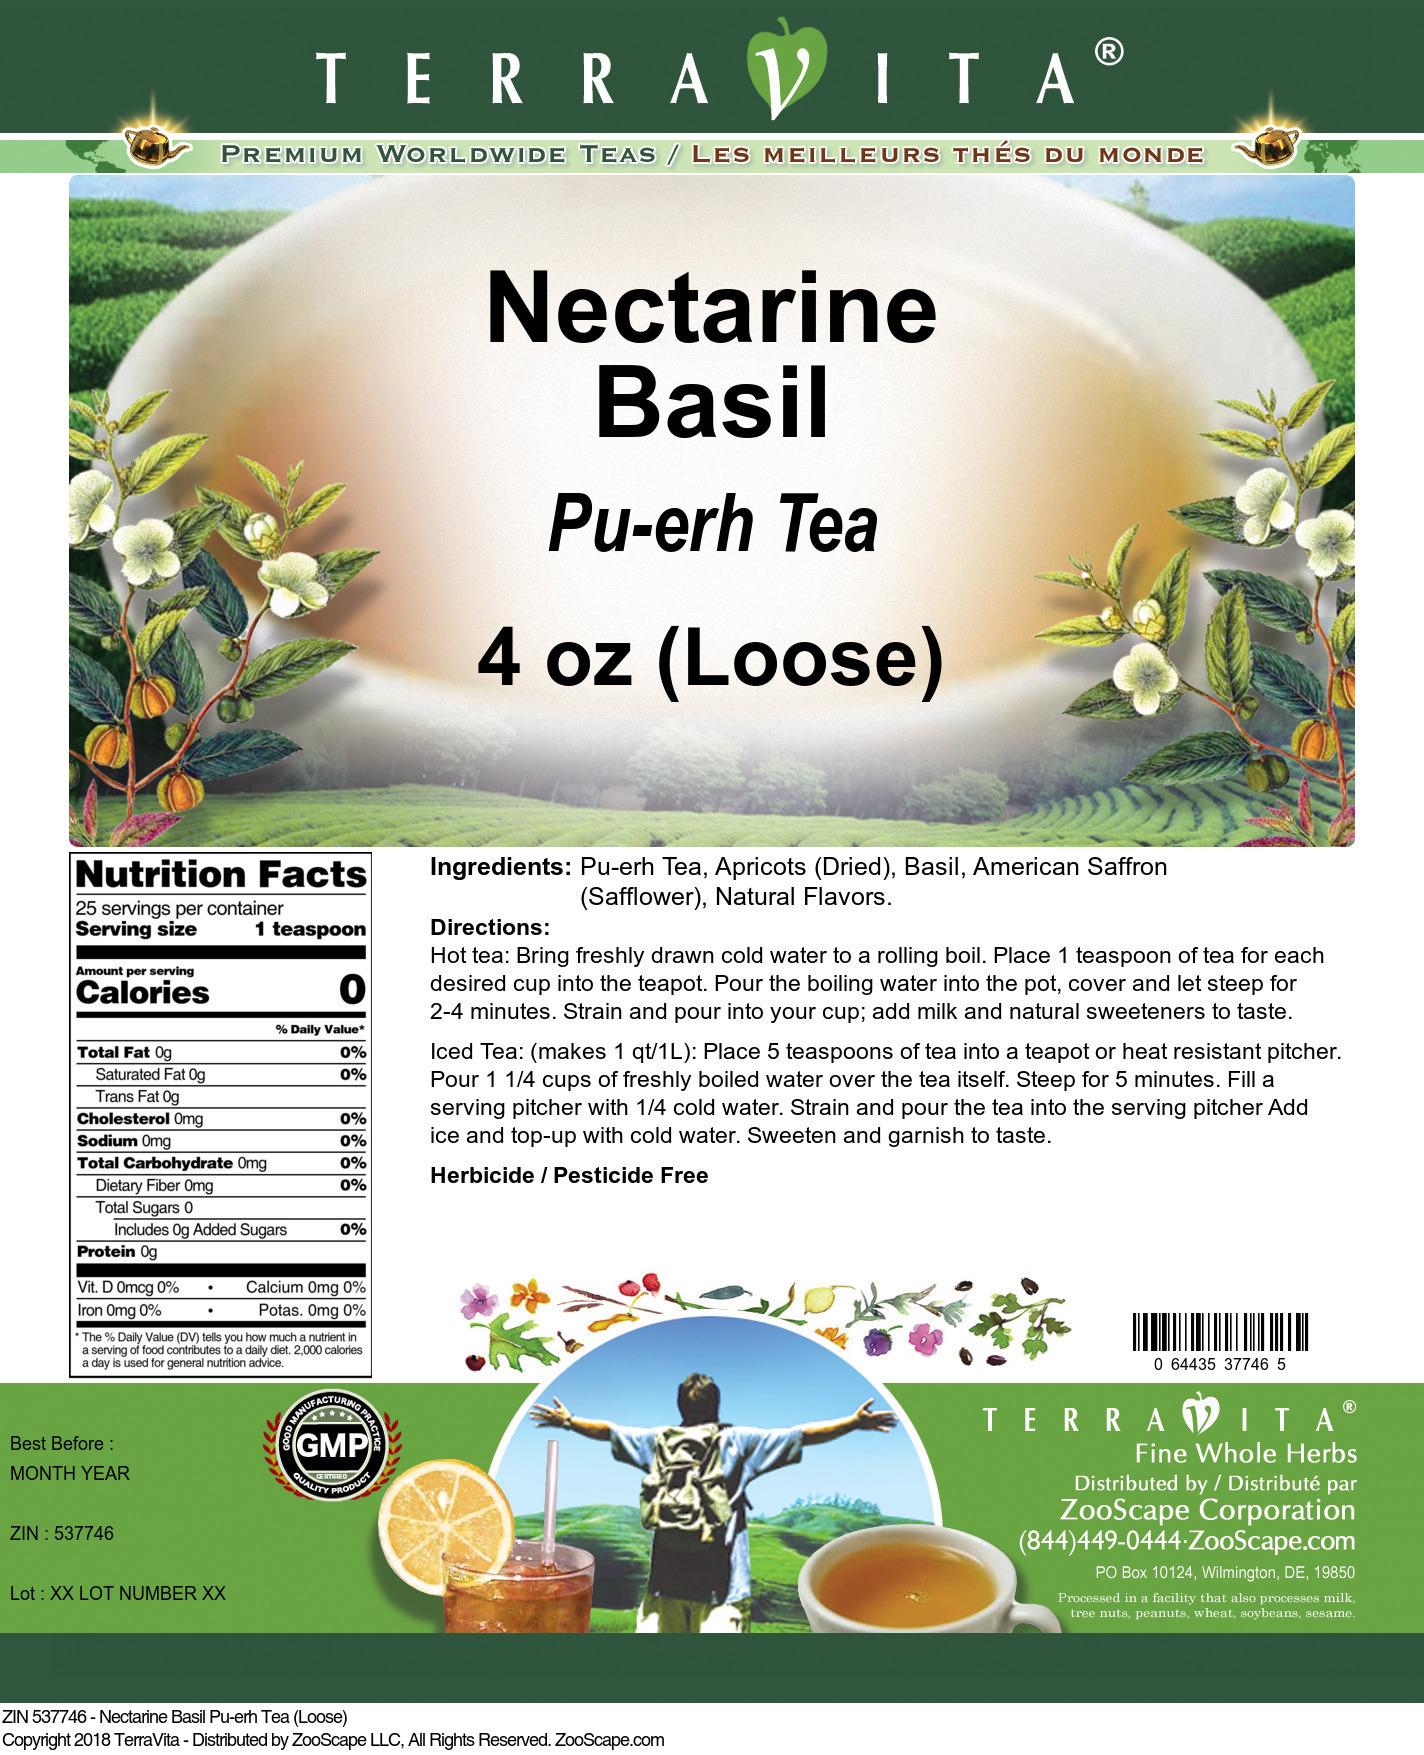 Nectarine Basil Pu-erh Tea (Loose)